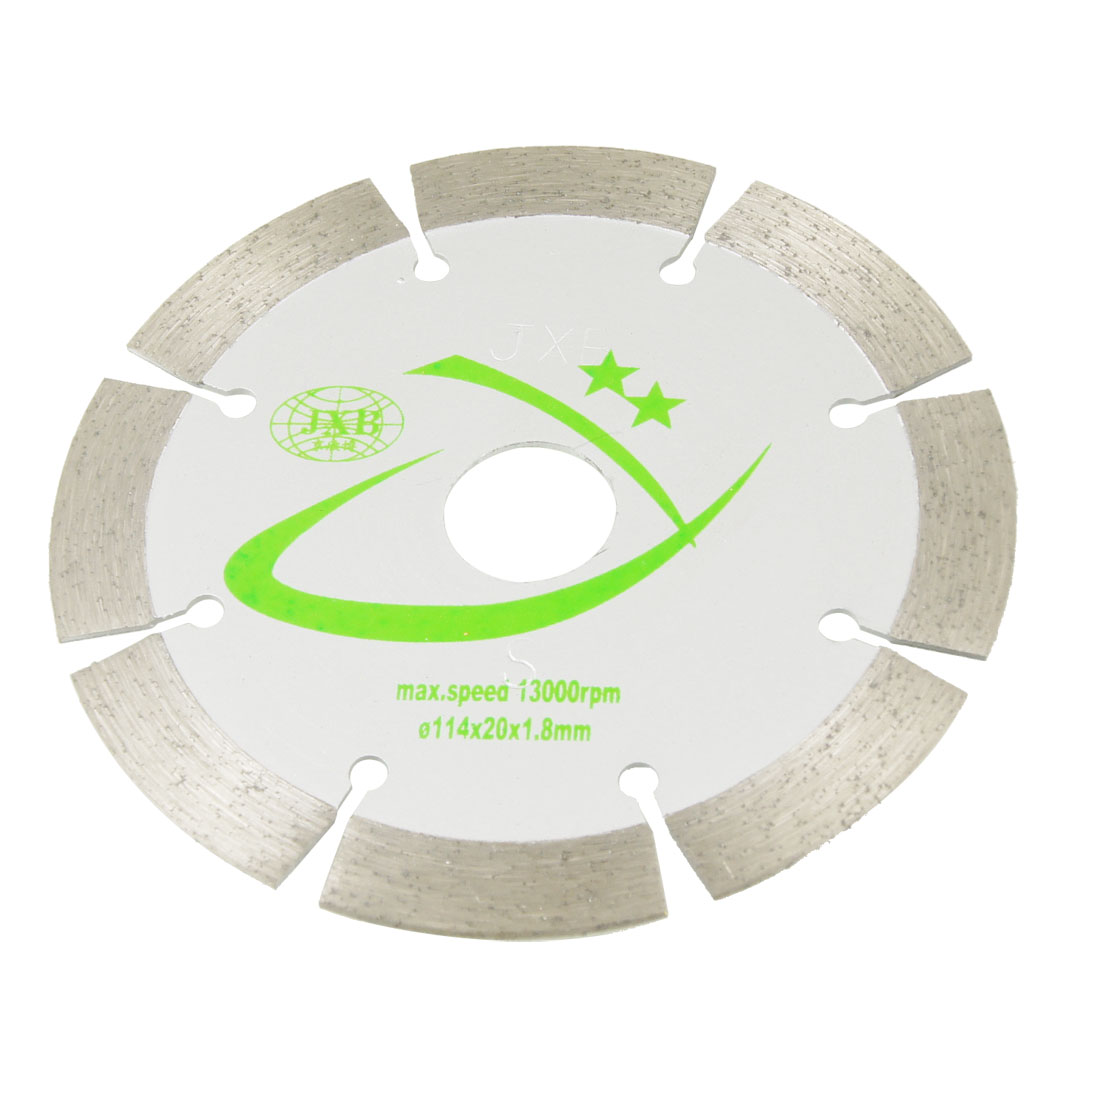 114mm x 21mm x 1.8mm Tile Cutting Wheel Diamond Saw Cutter